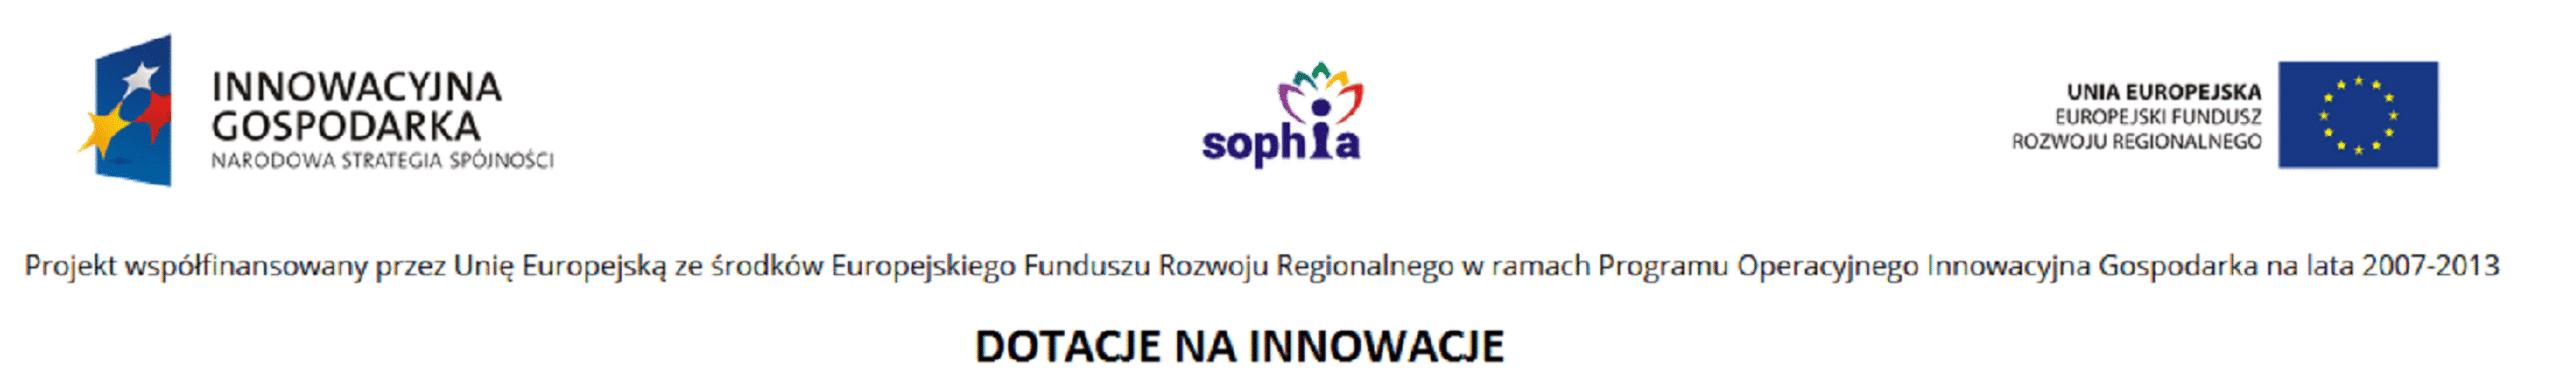 Sophia_dodatacje_logotypynowe2